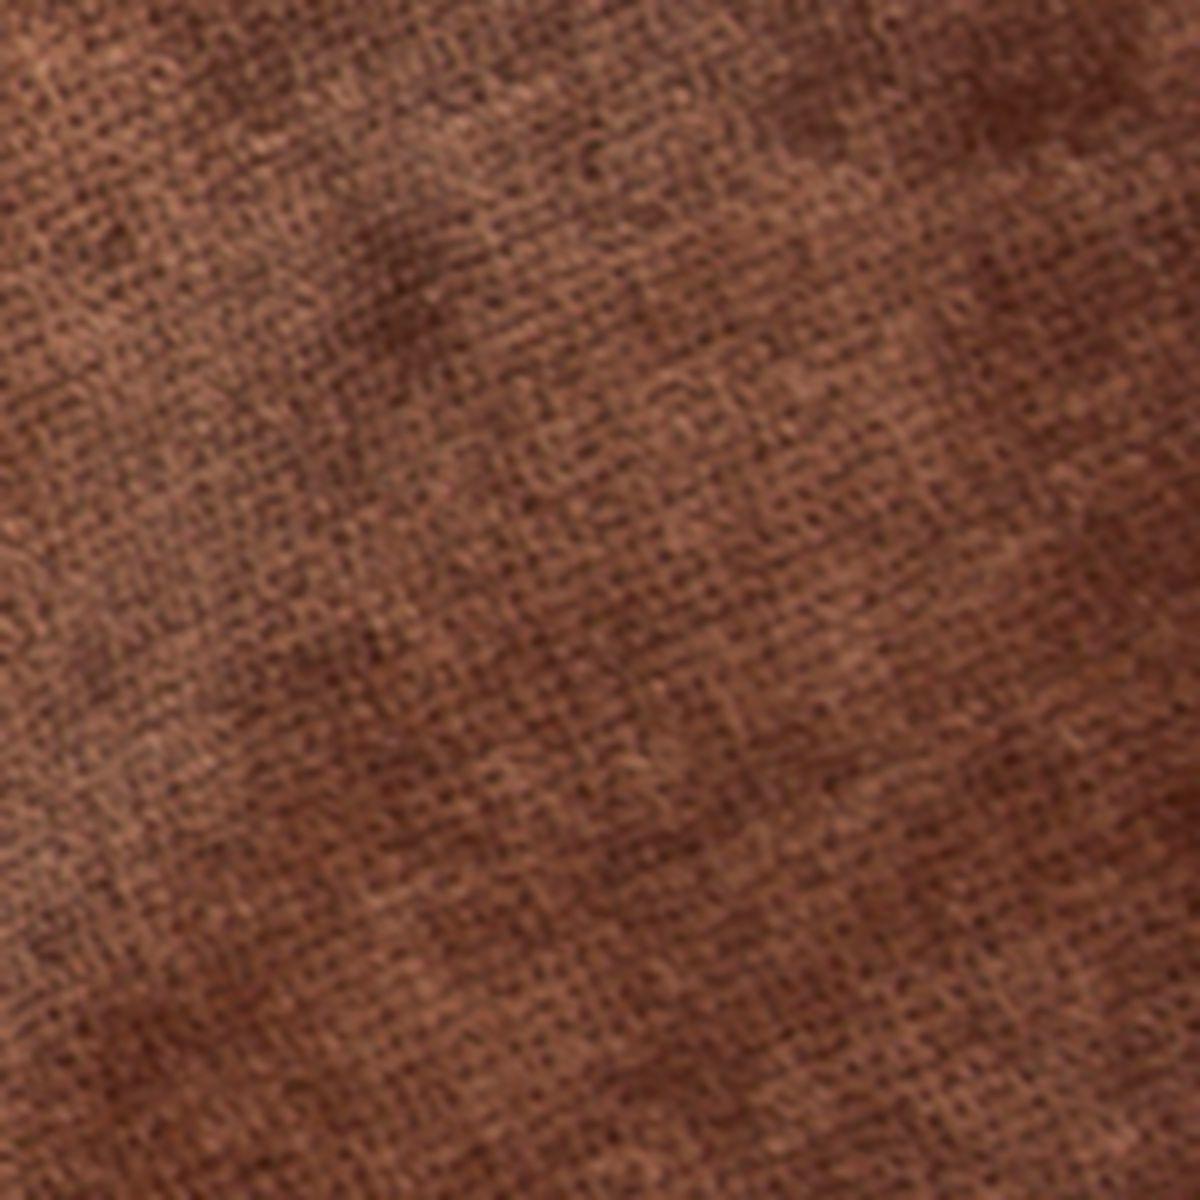 HiEnd Accents Clearwater Pine Three-Piece Towel Set